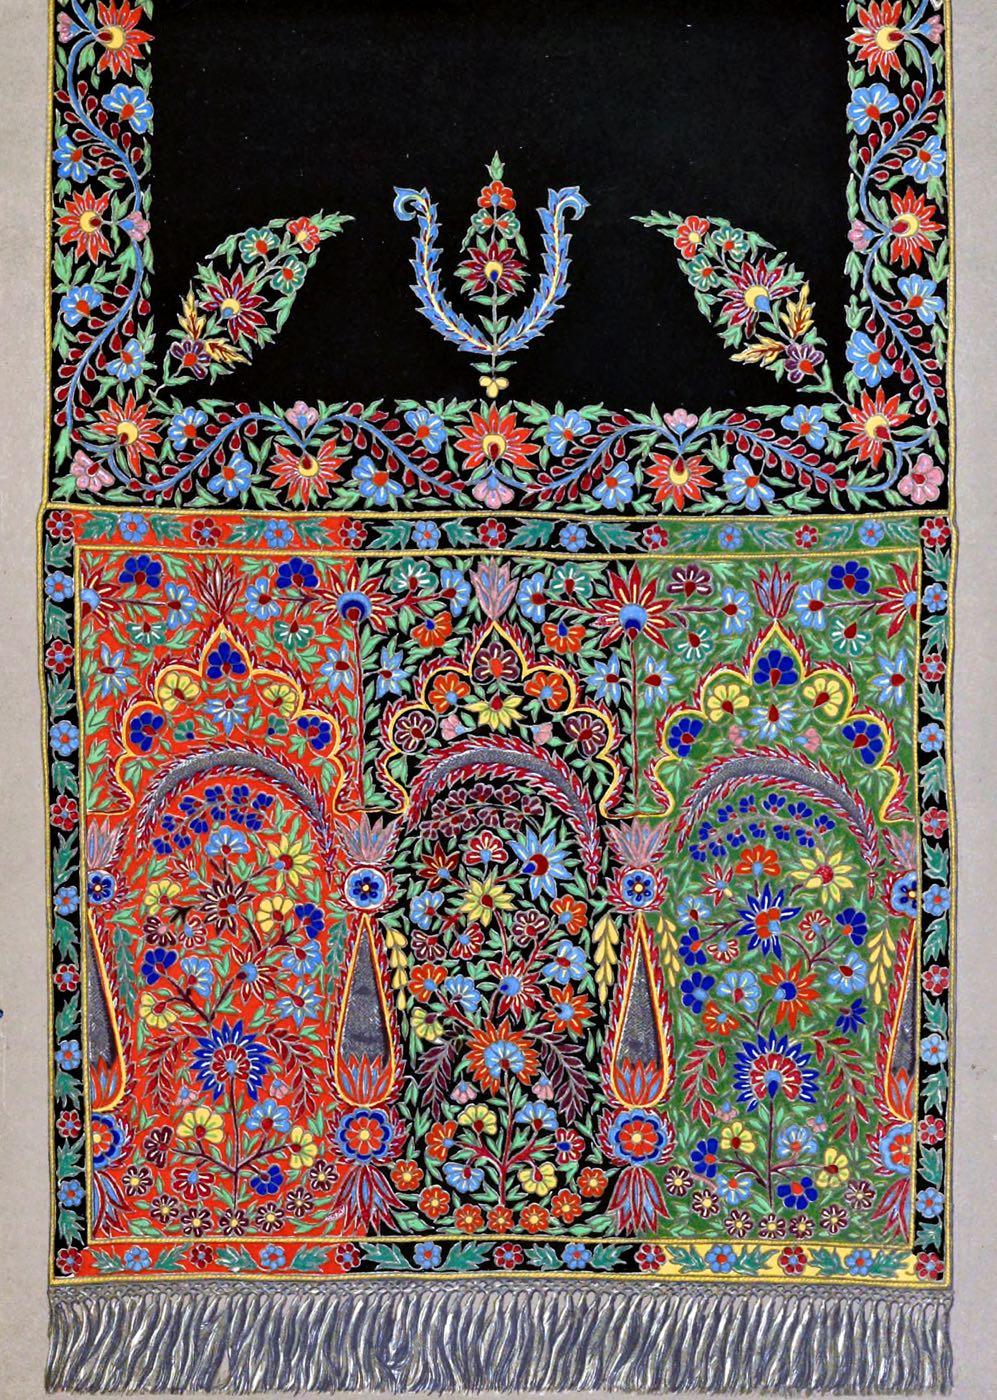 Bobinet, Scarf, India, Textil, Art, Design, India